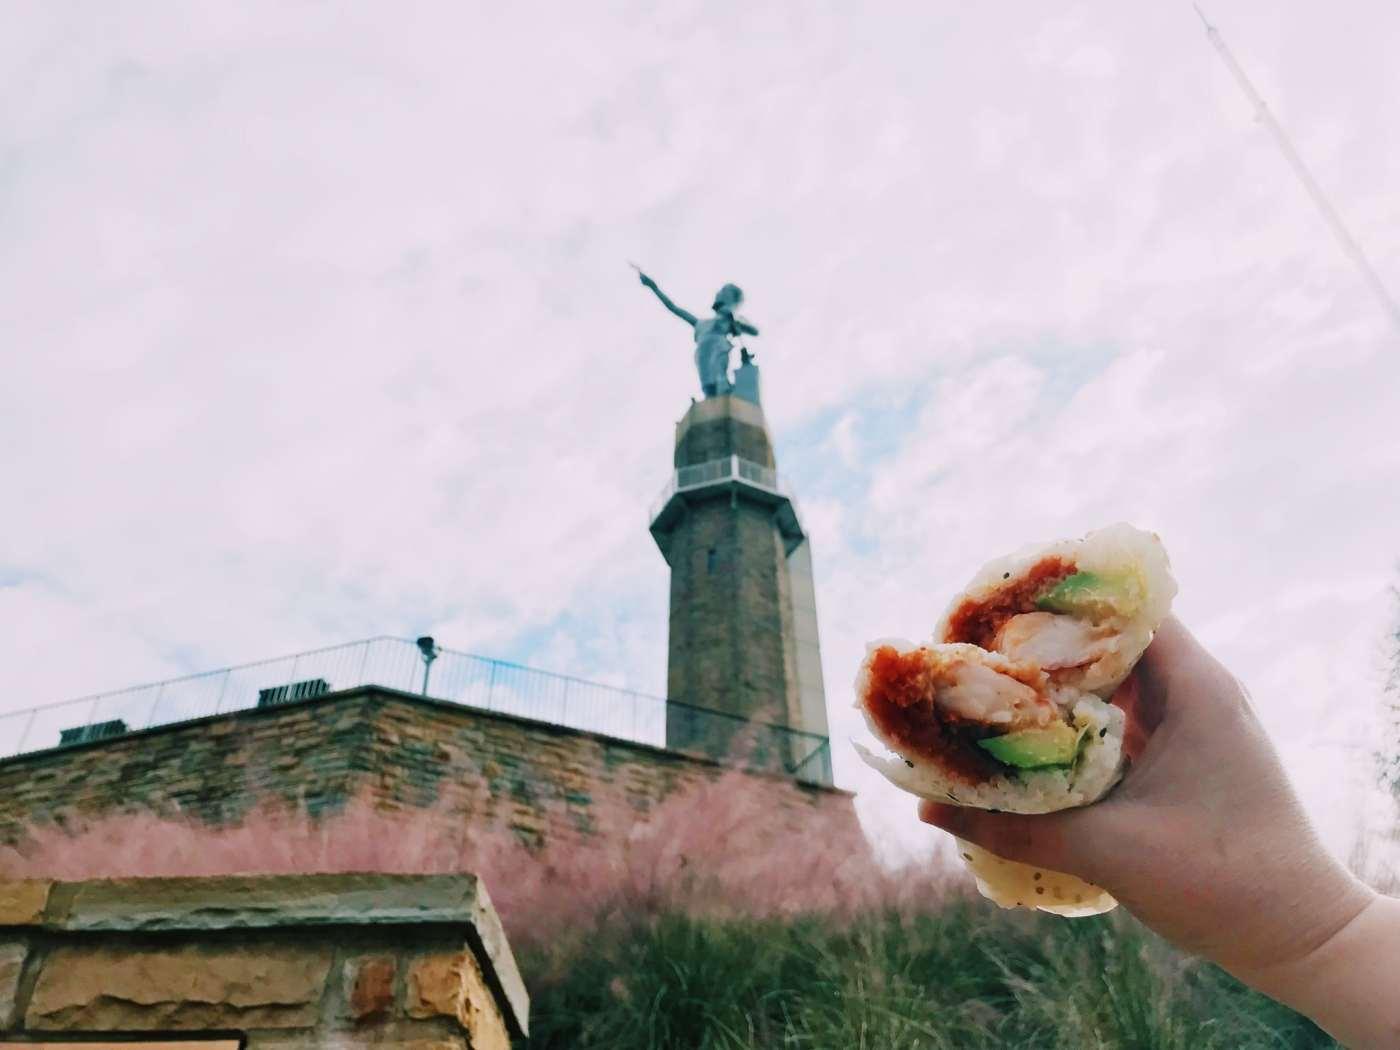 Birmingham, Wasabi Juan's, sushi, food, holiday entertaining